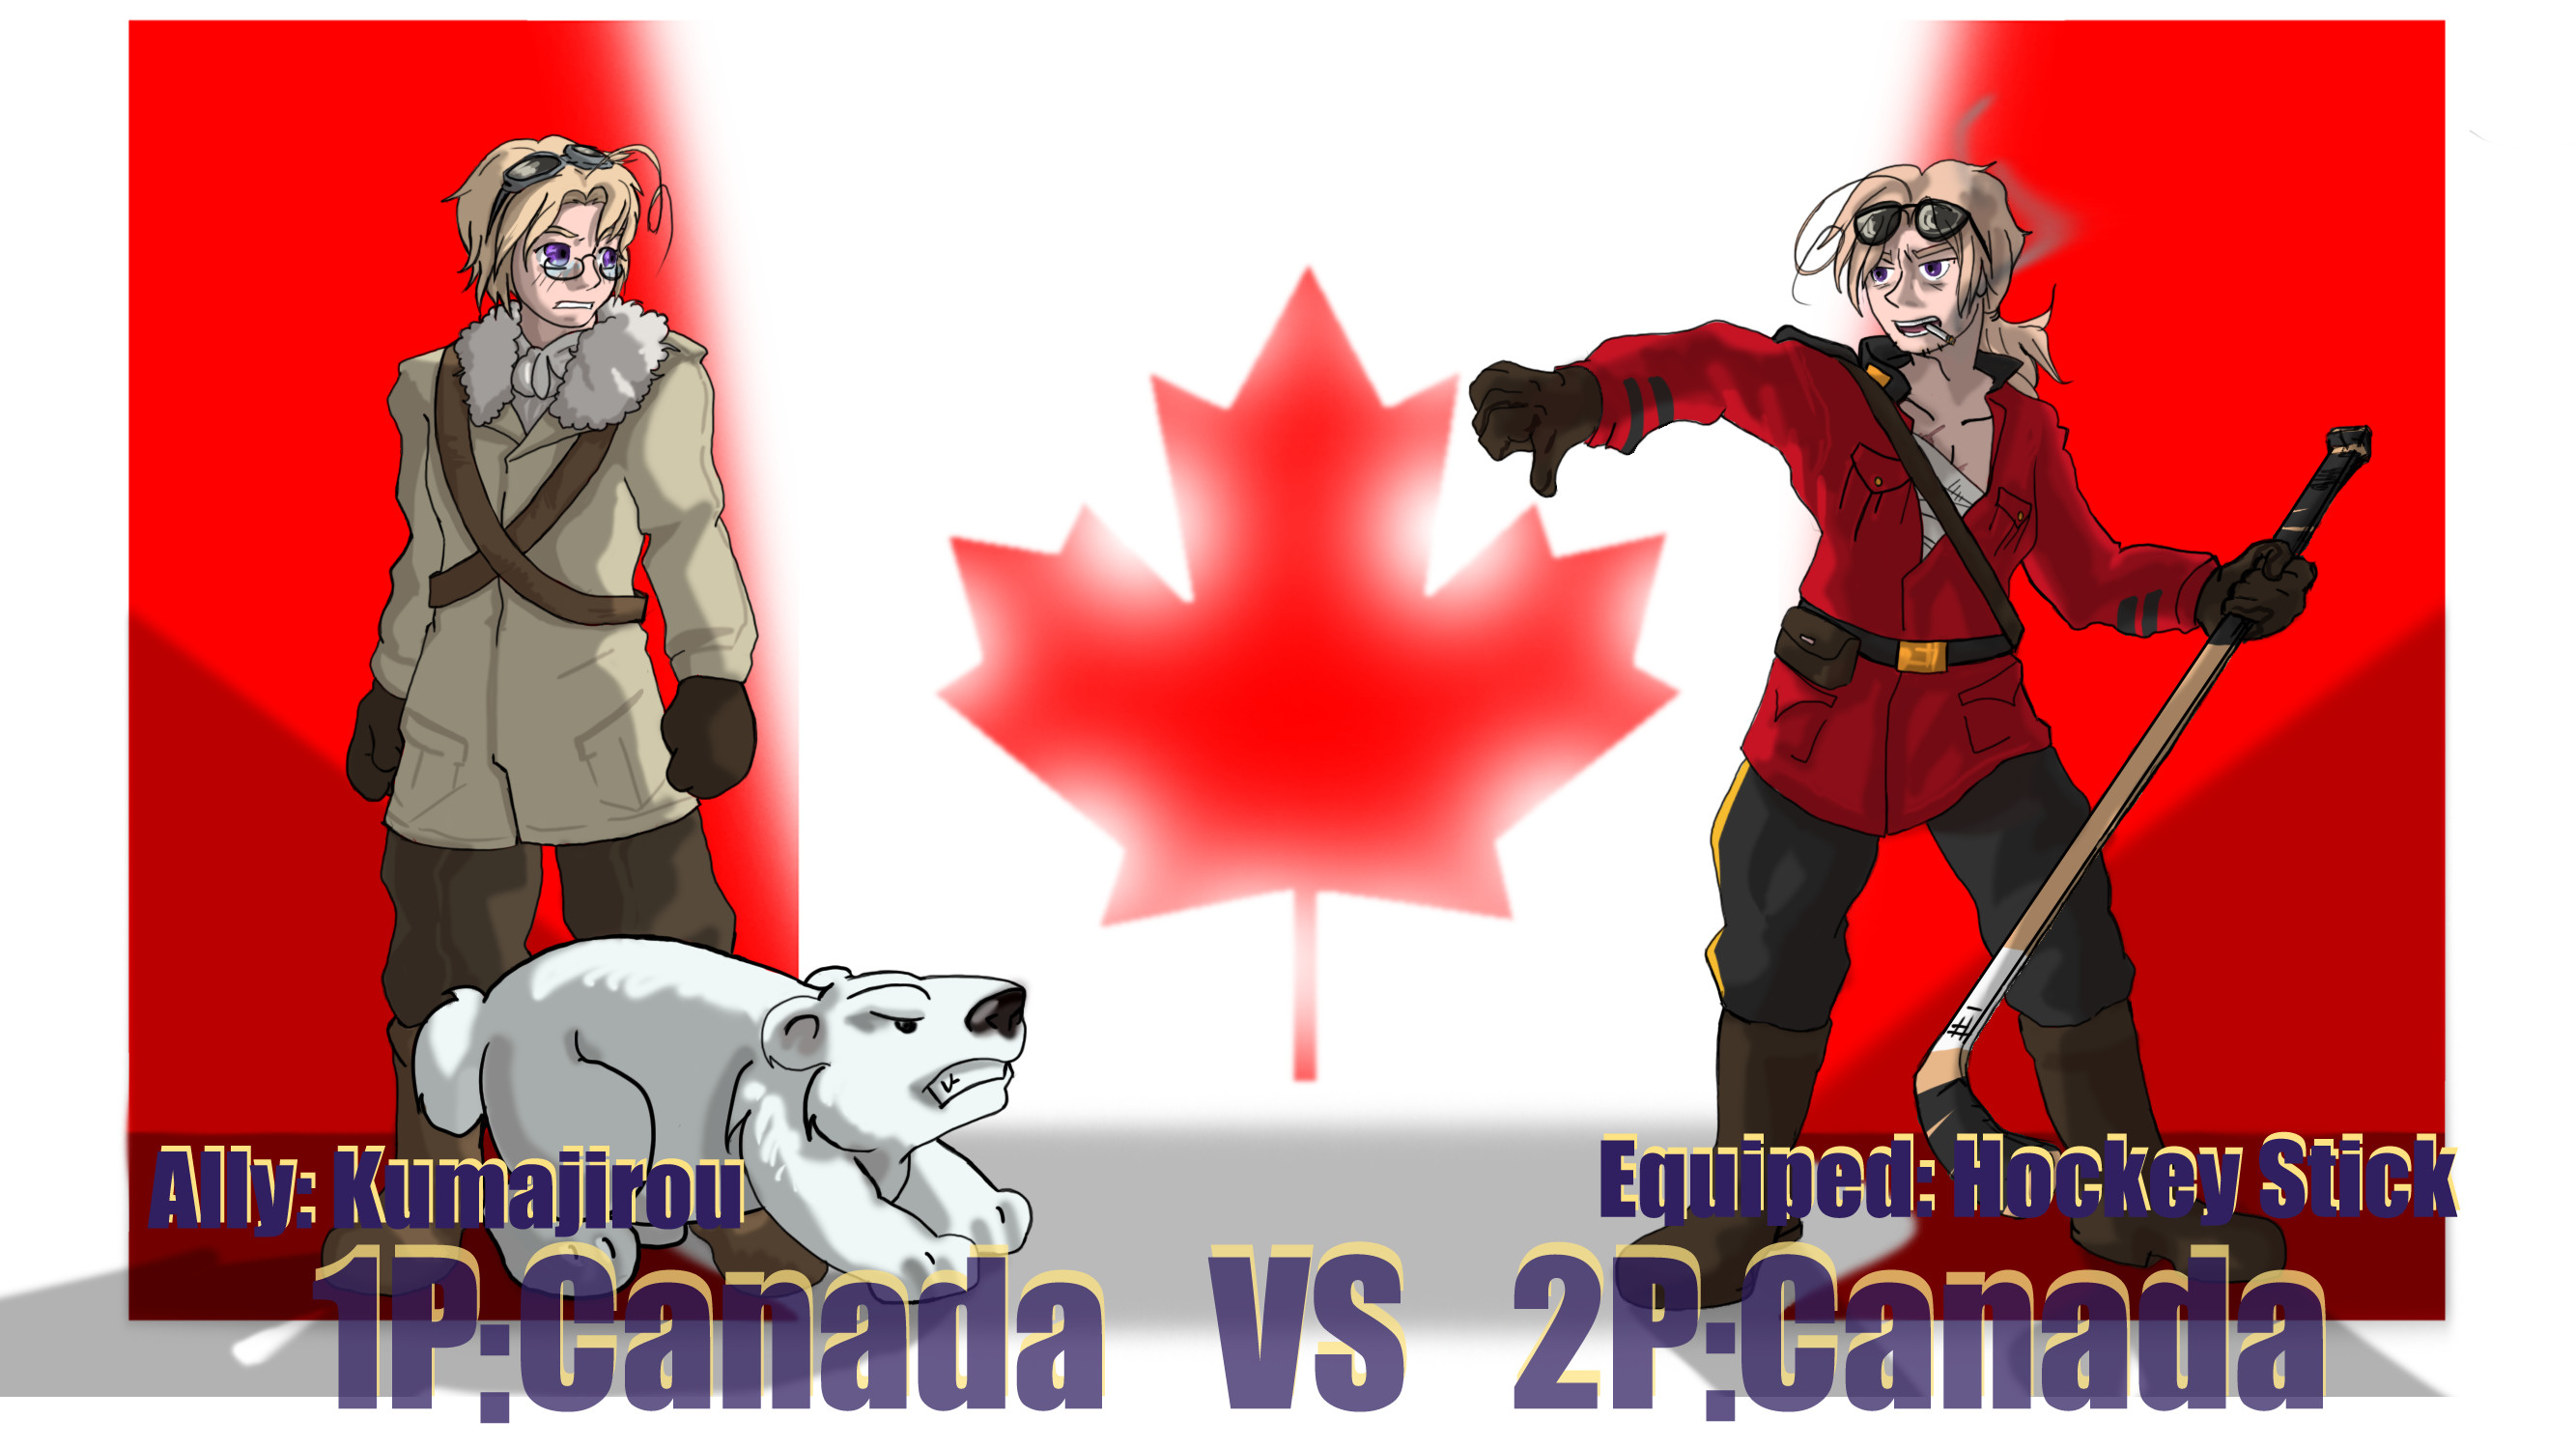 … Hetalia Fights: 1P vs 2PCanada by Sagealina